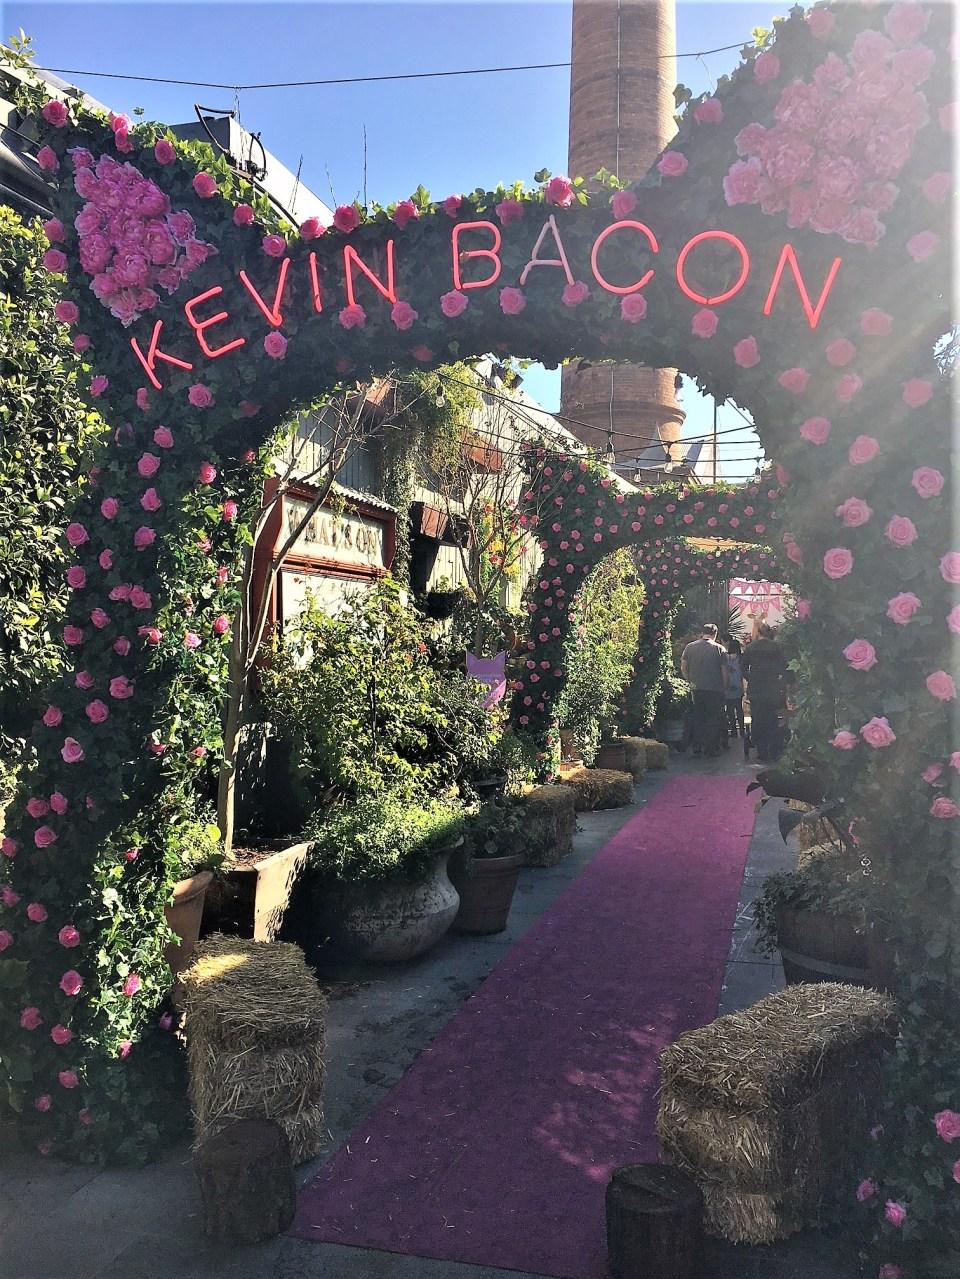 Kevin Bacon 2